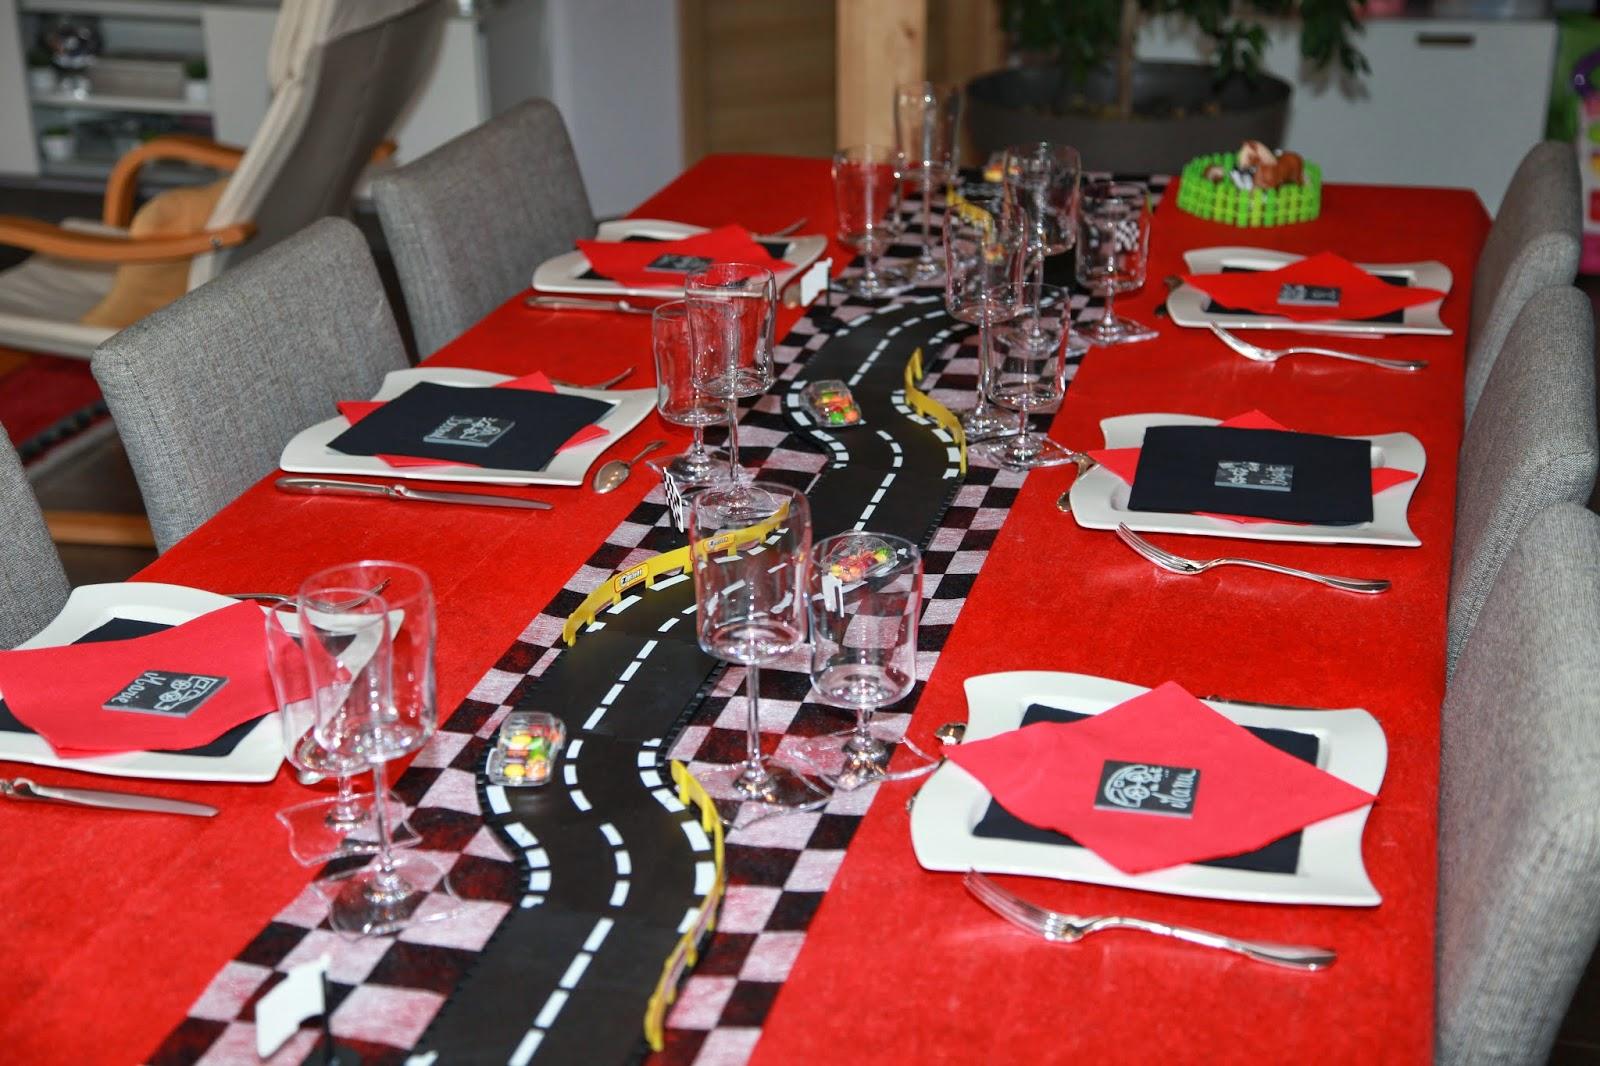 decoration de table voiture. Black Bedroom Furniture Sets. Home Design Ideas